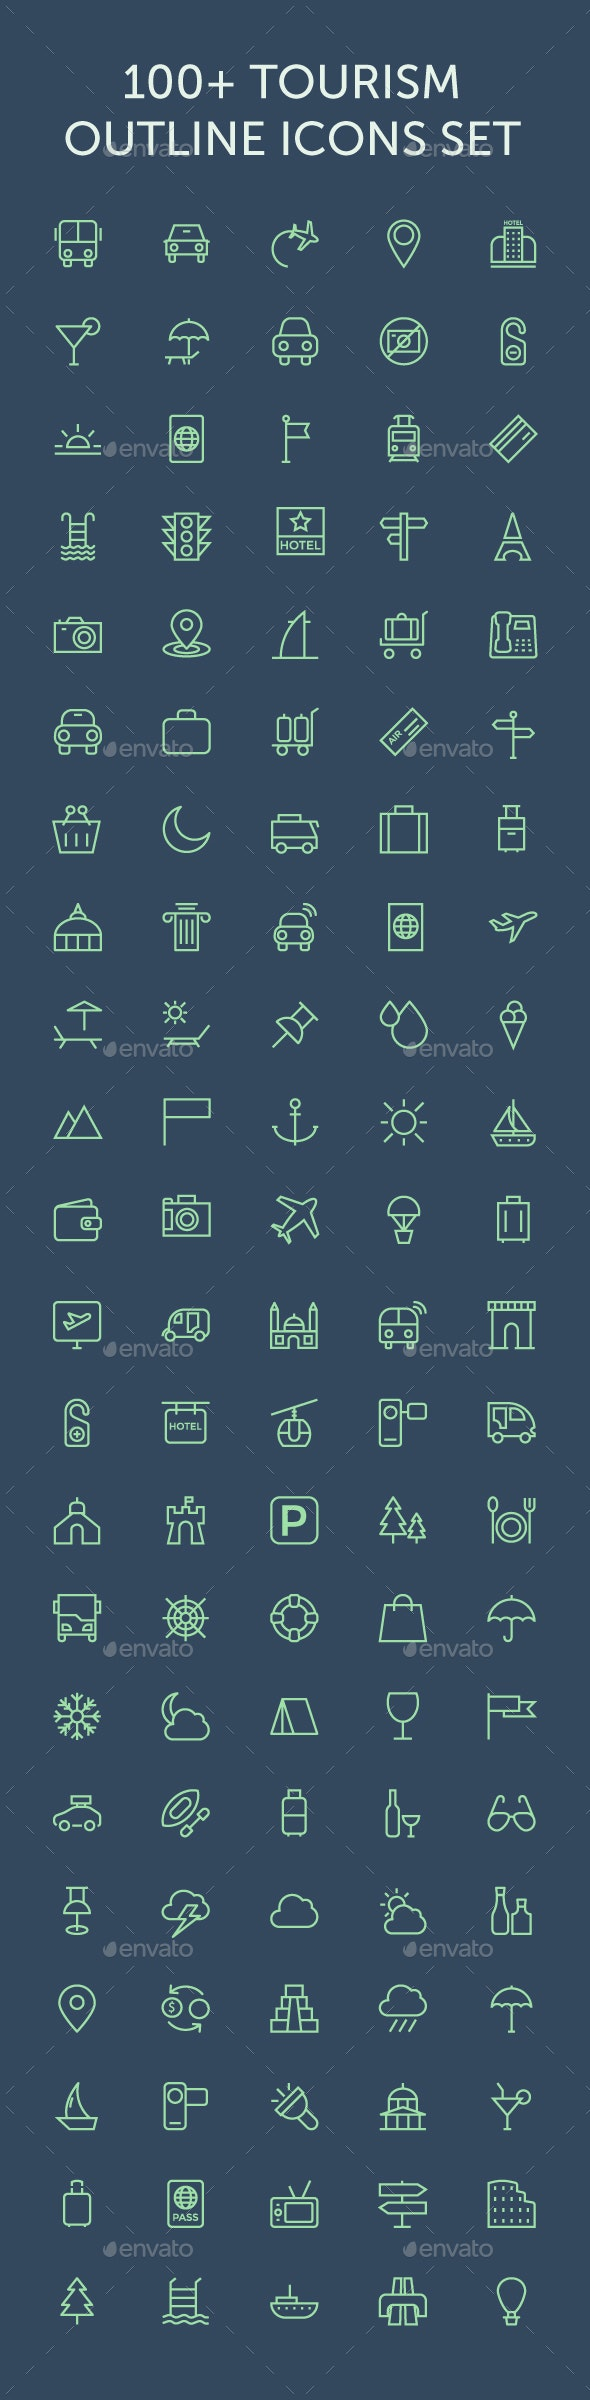 100+ Tourism Outline Icons Set - Icons